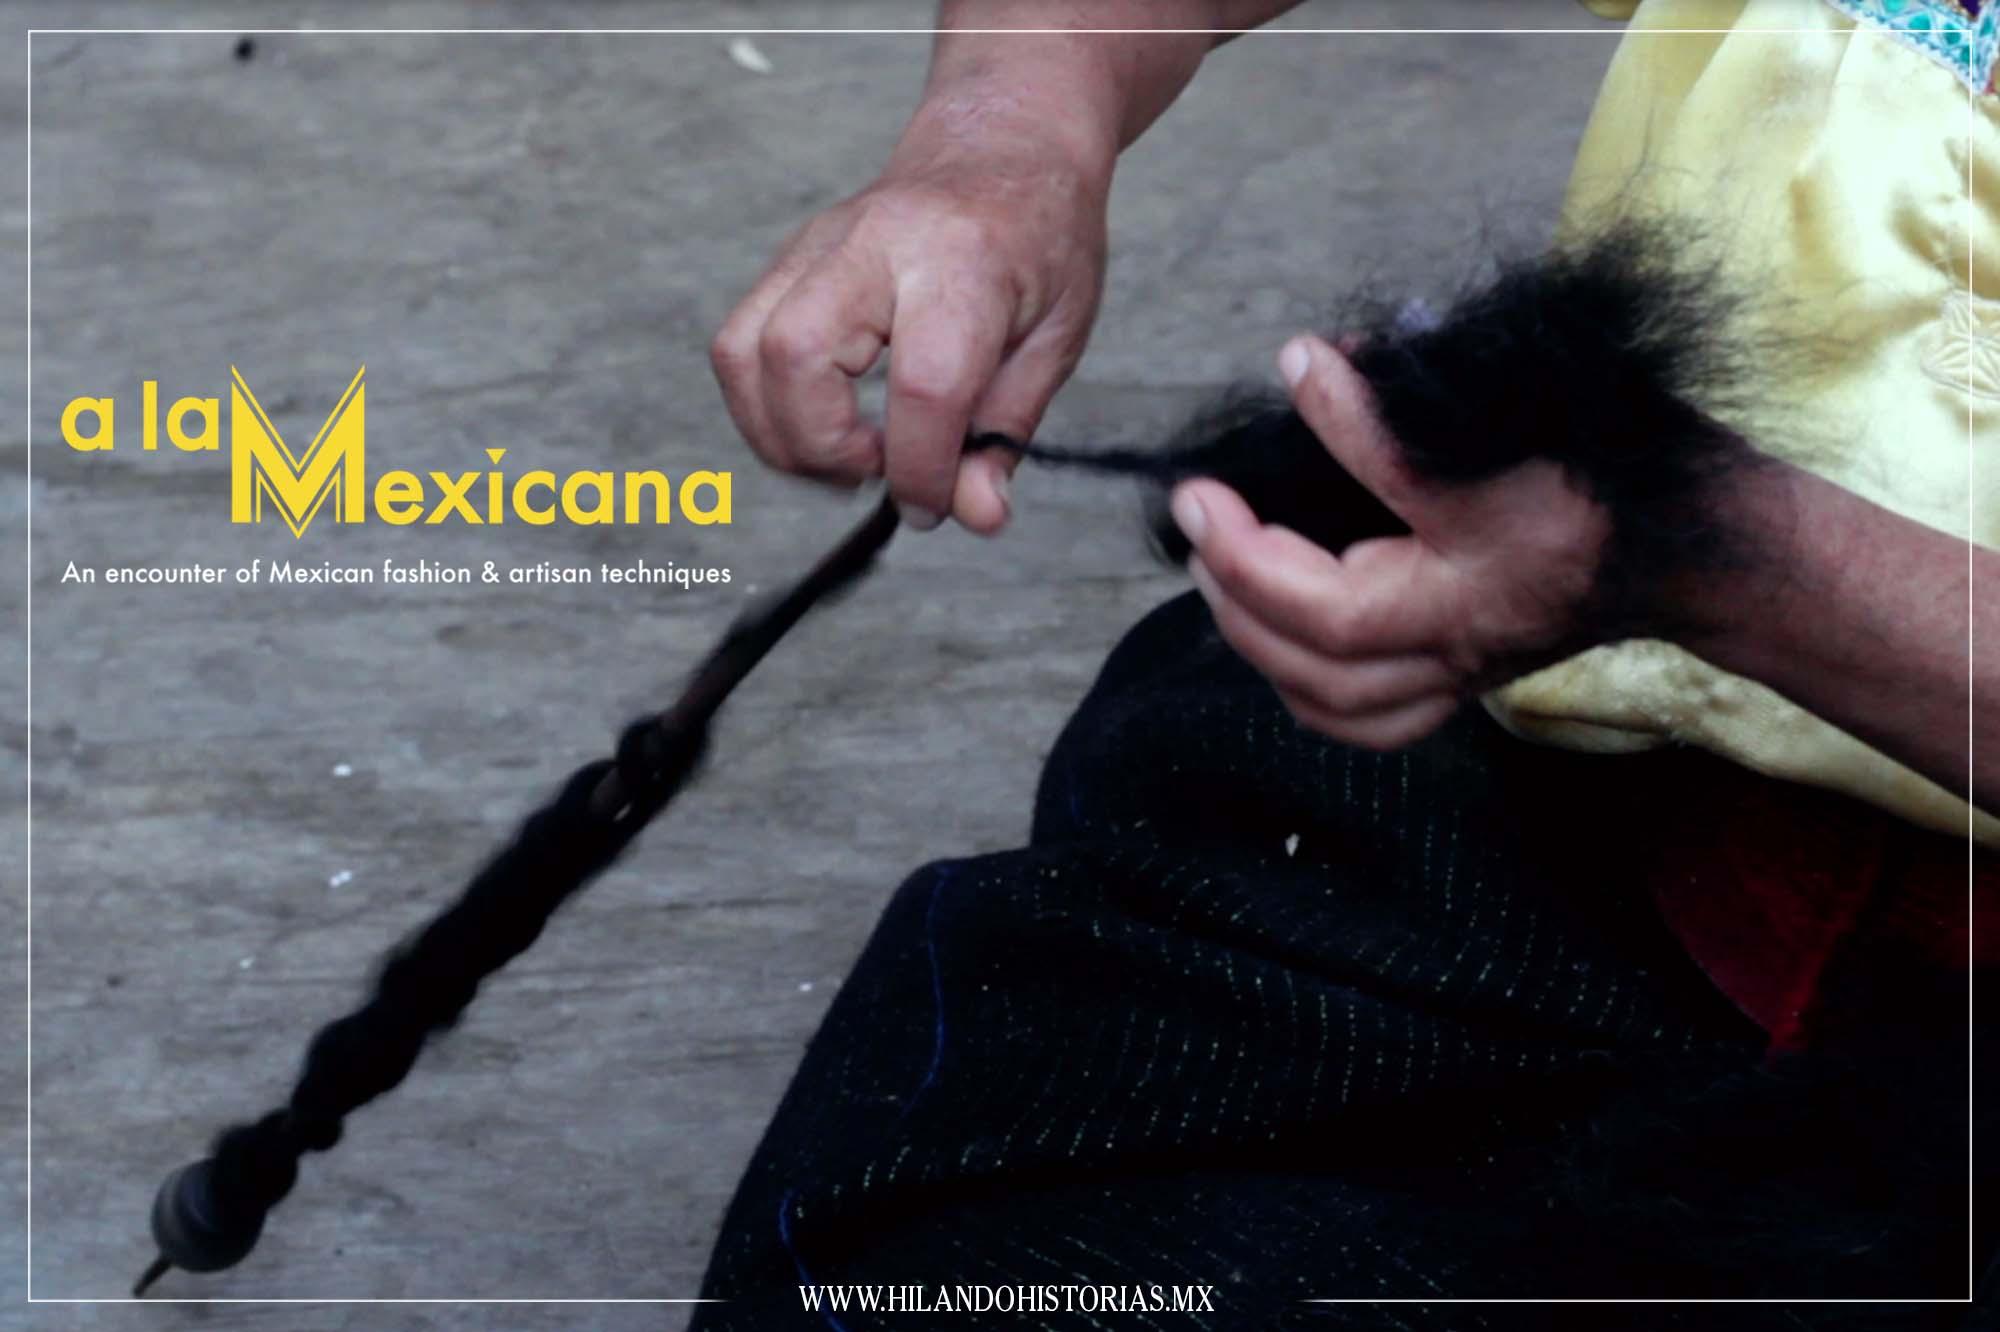 A LA MEXICANA. An encounter of Mexican fashion & artisan techniques